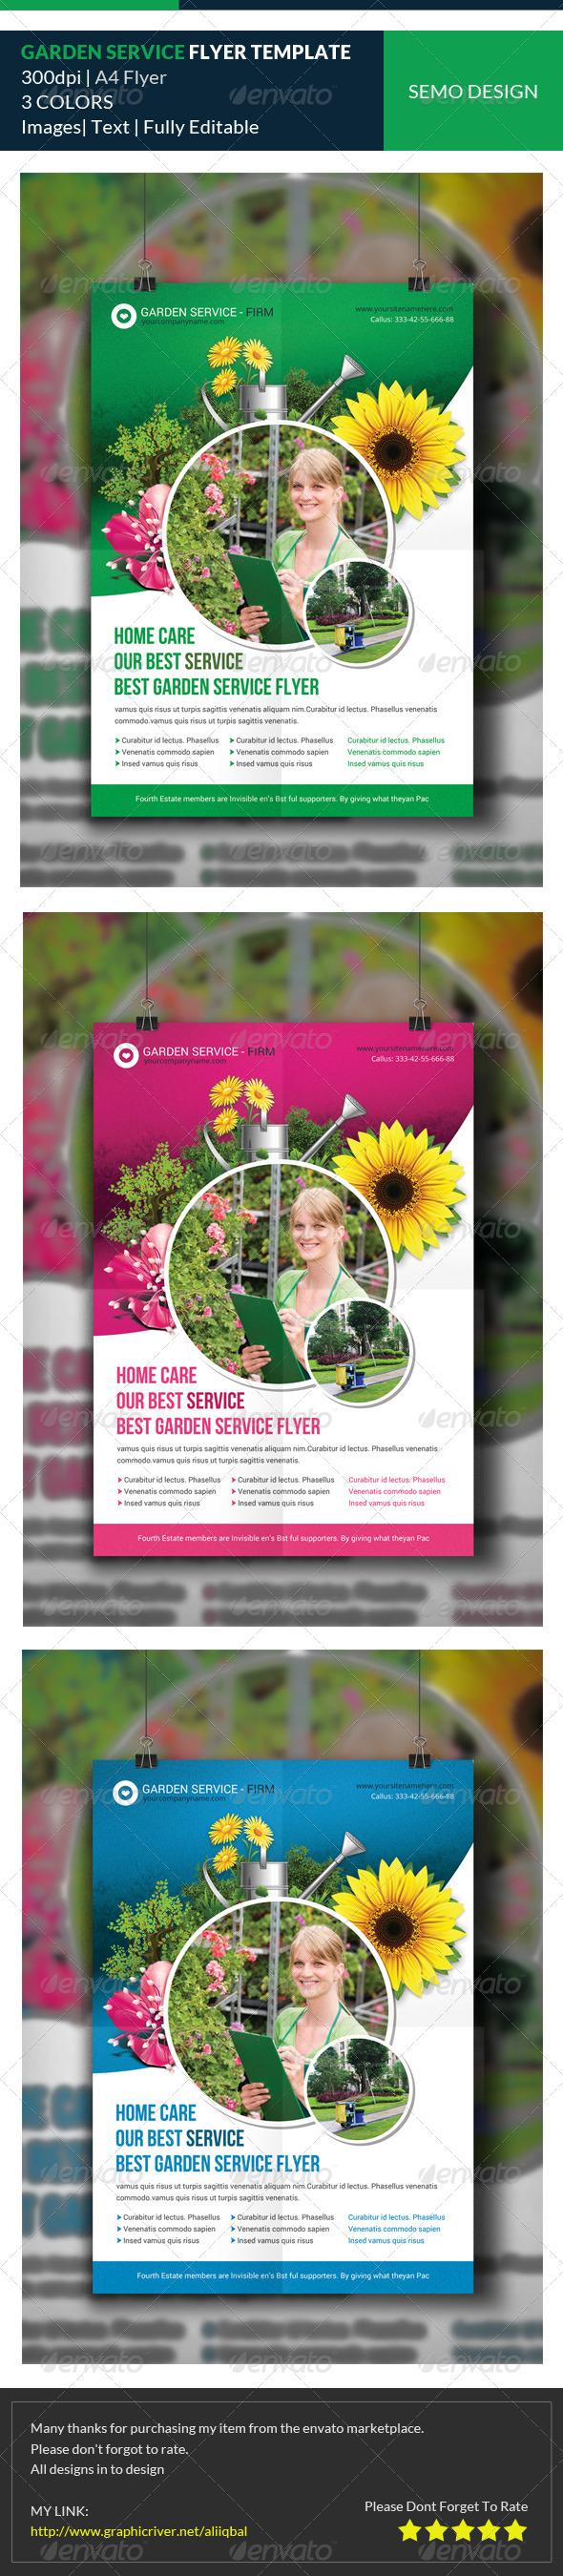 GraphicRiver Garden Service Flyer Template 8145520